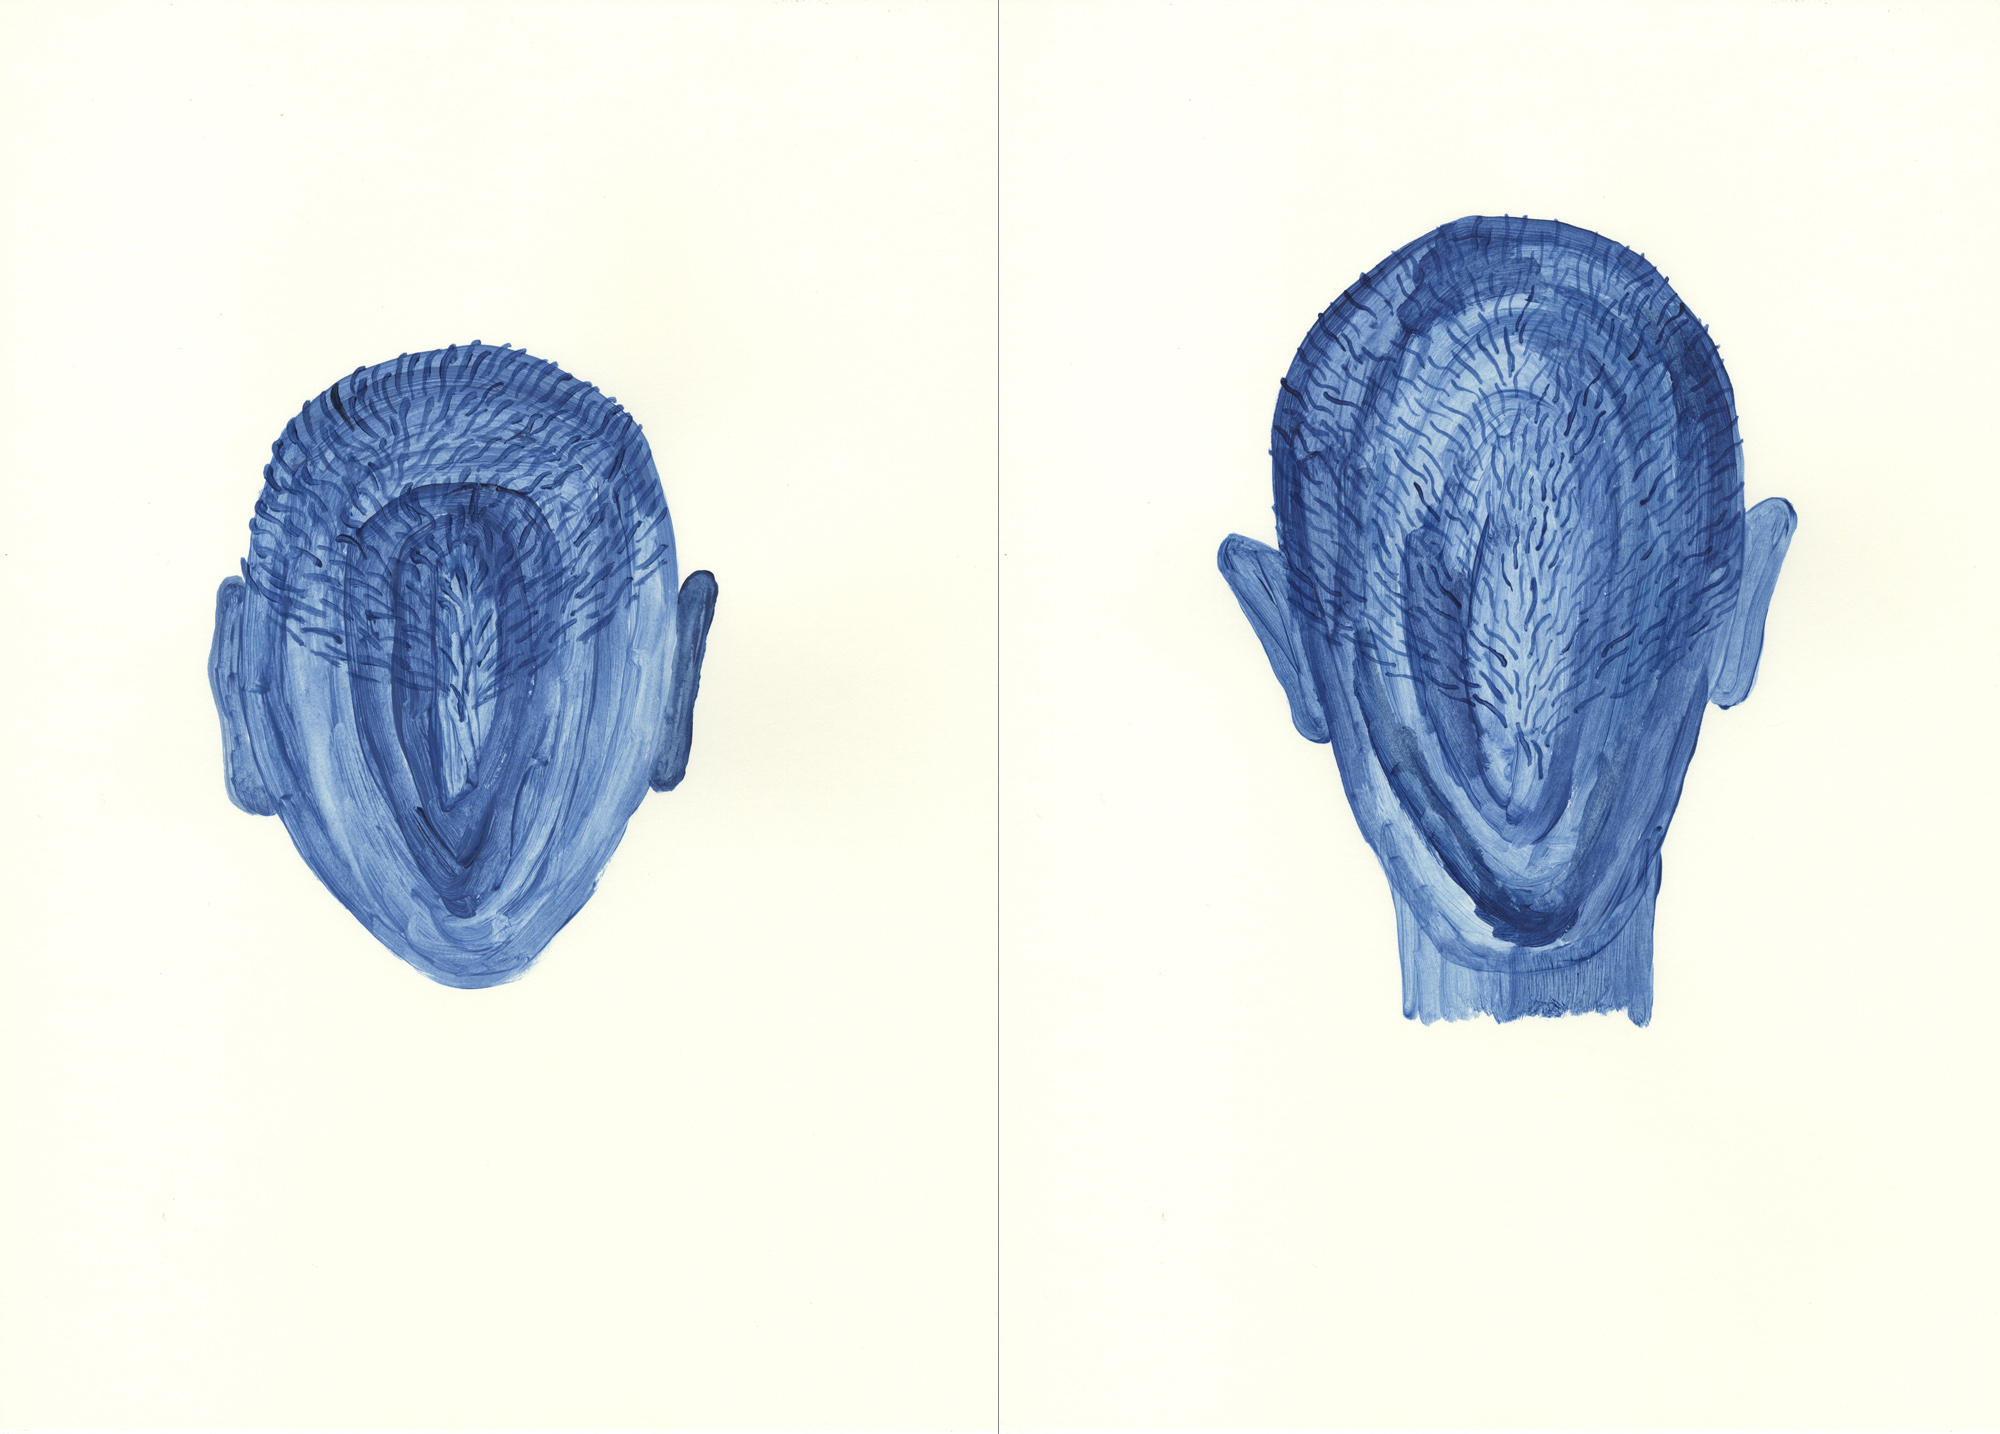 Autorretrato pipa. Acrílico sobre papel. (Díptico) 42x60cm